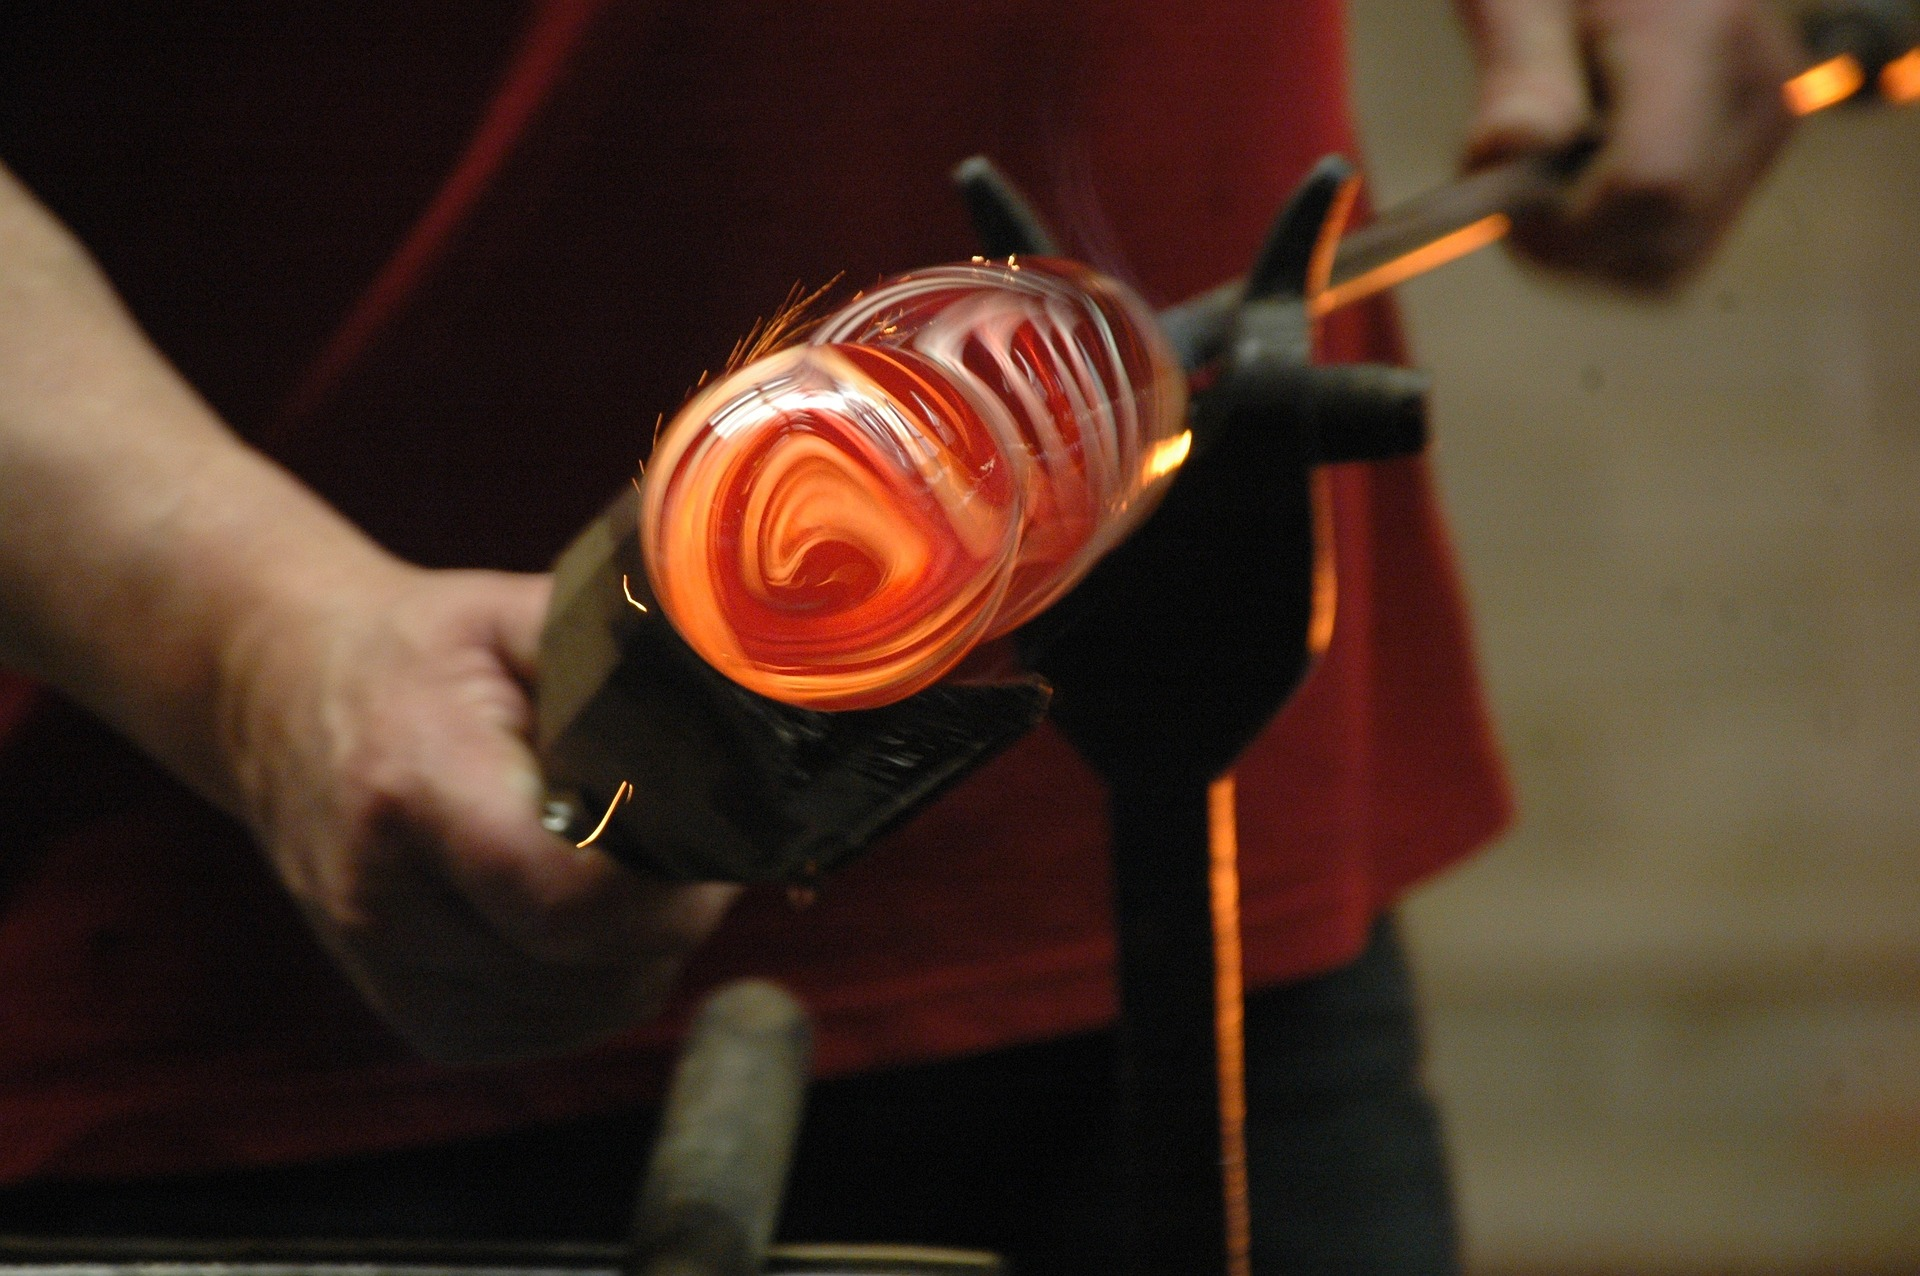 https://sydney-craft-week-prd.s3.amazonaws.com/media/uploads/images/glass-1246679_1920.jpg